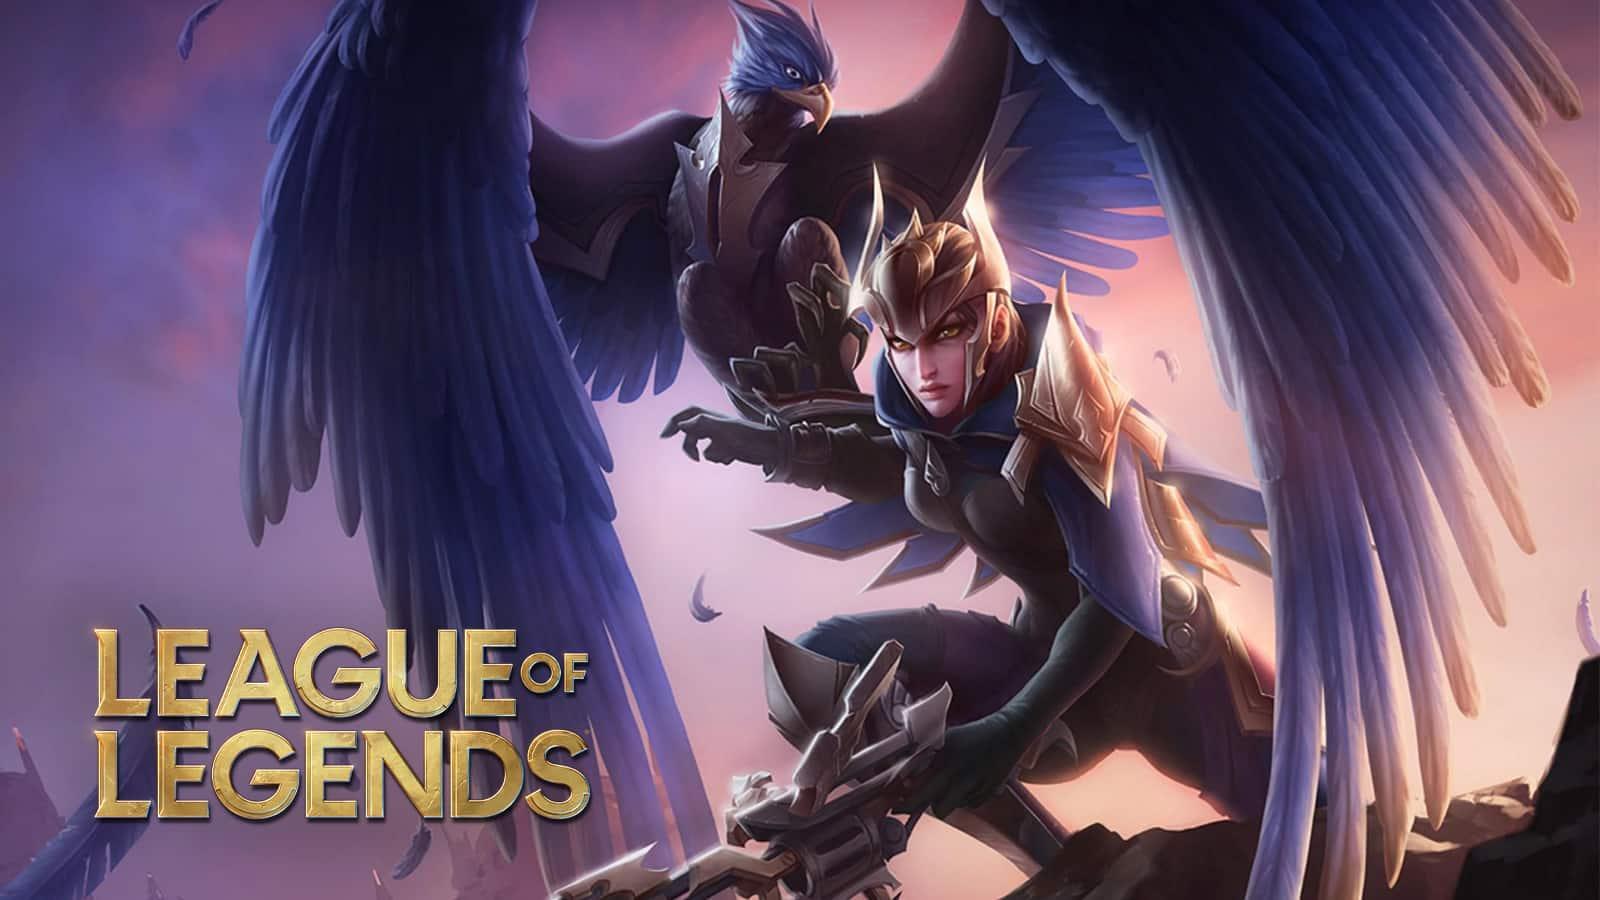 Quinn League of Legends potential season 12 vgu after udyr rework